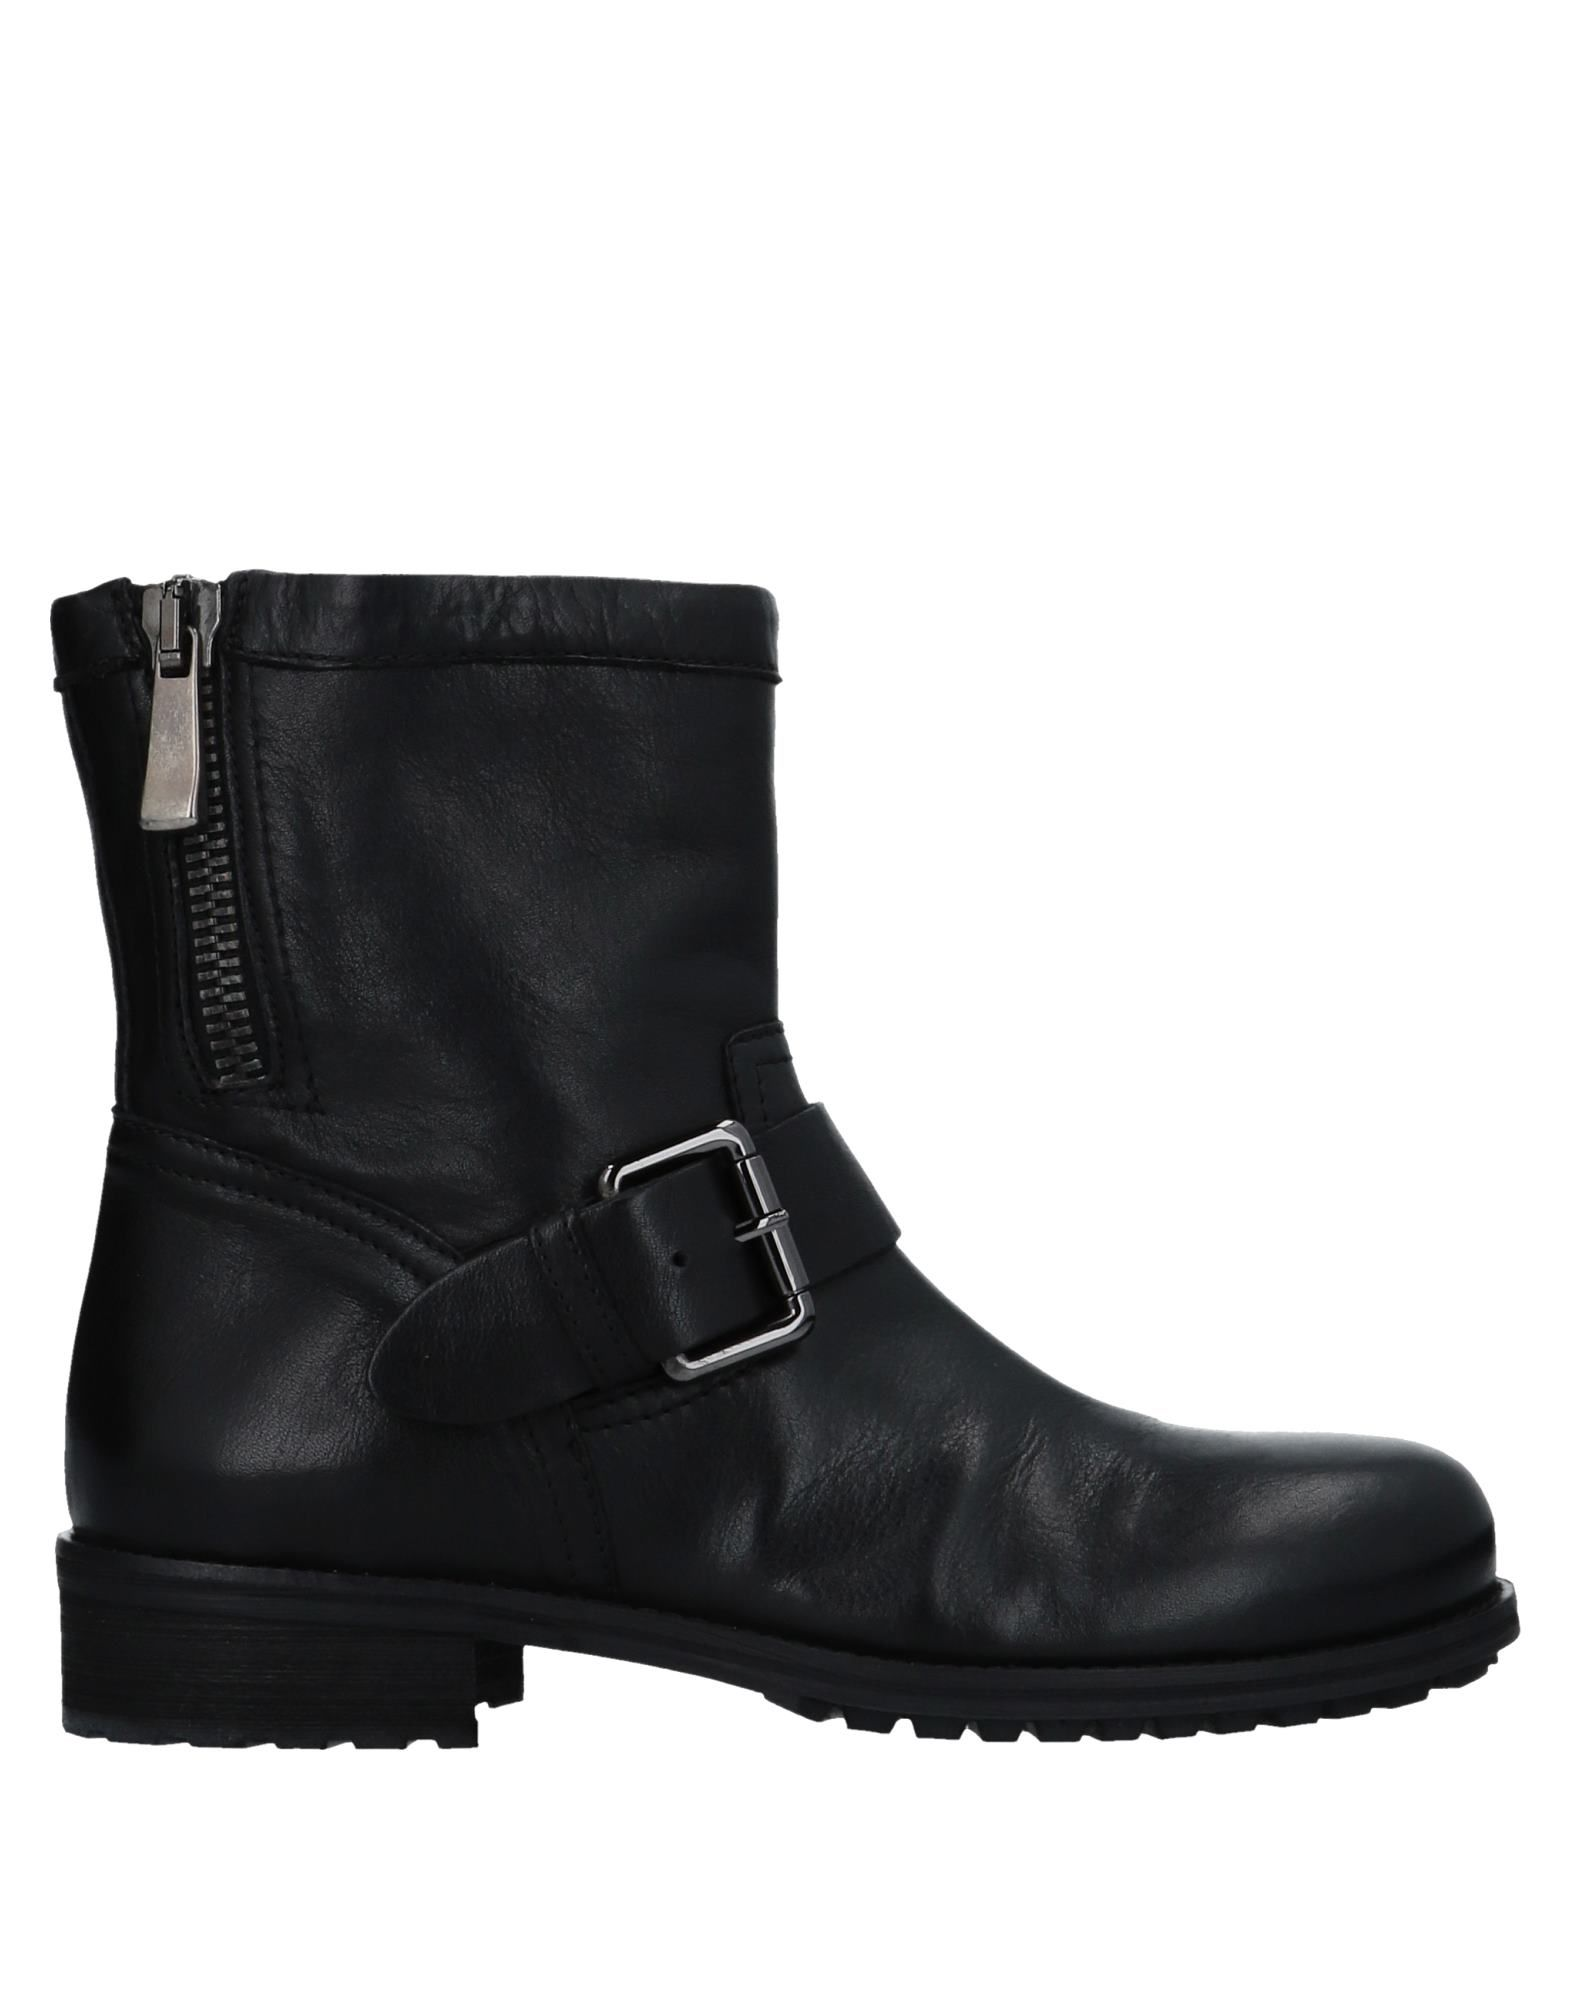 J D Julie Dee Stiefelette Damen  11539606OE Gute Qualität beliebte Schuhe